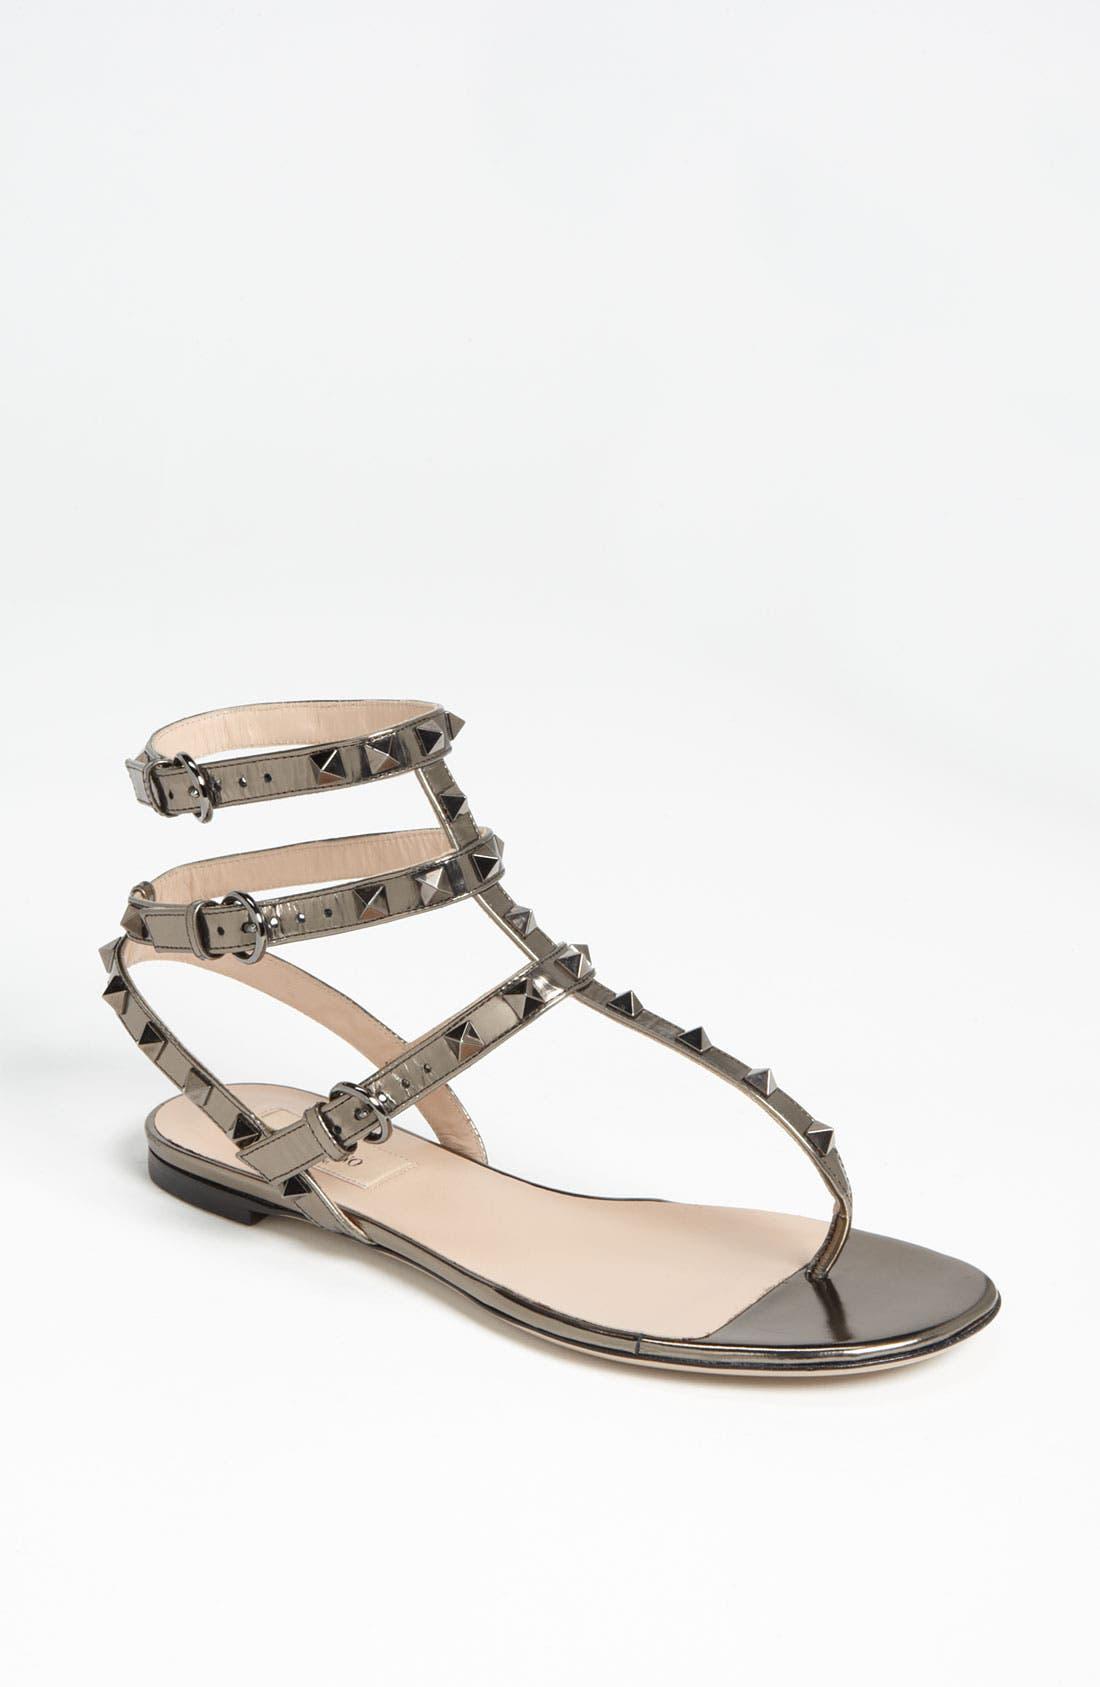 Main Image - VALENTINO GARAVANI 'Rockstud' Flat Sandal